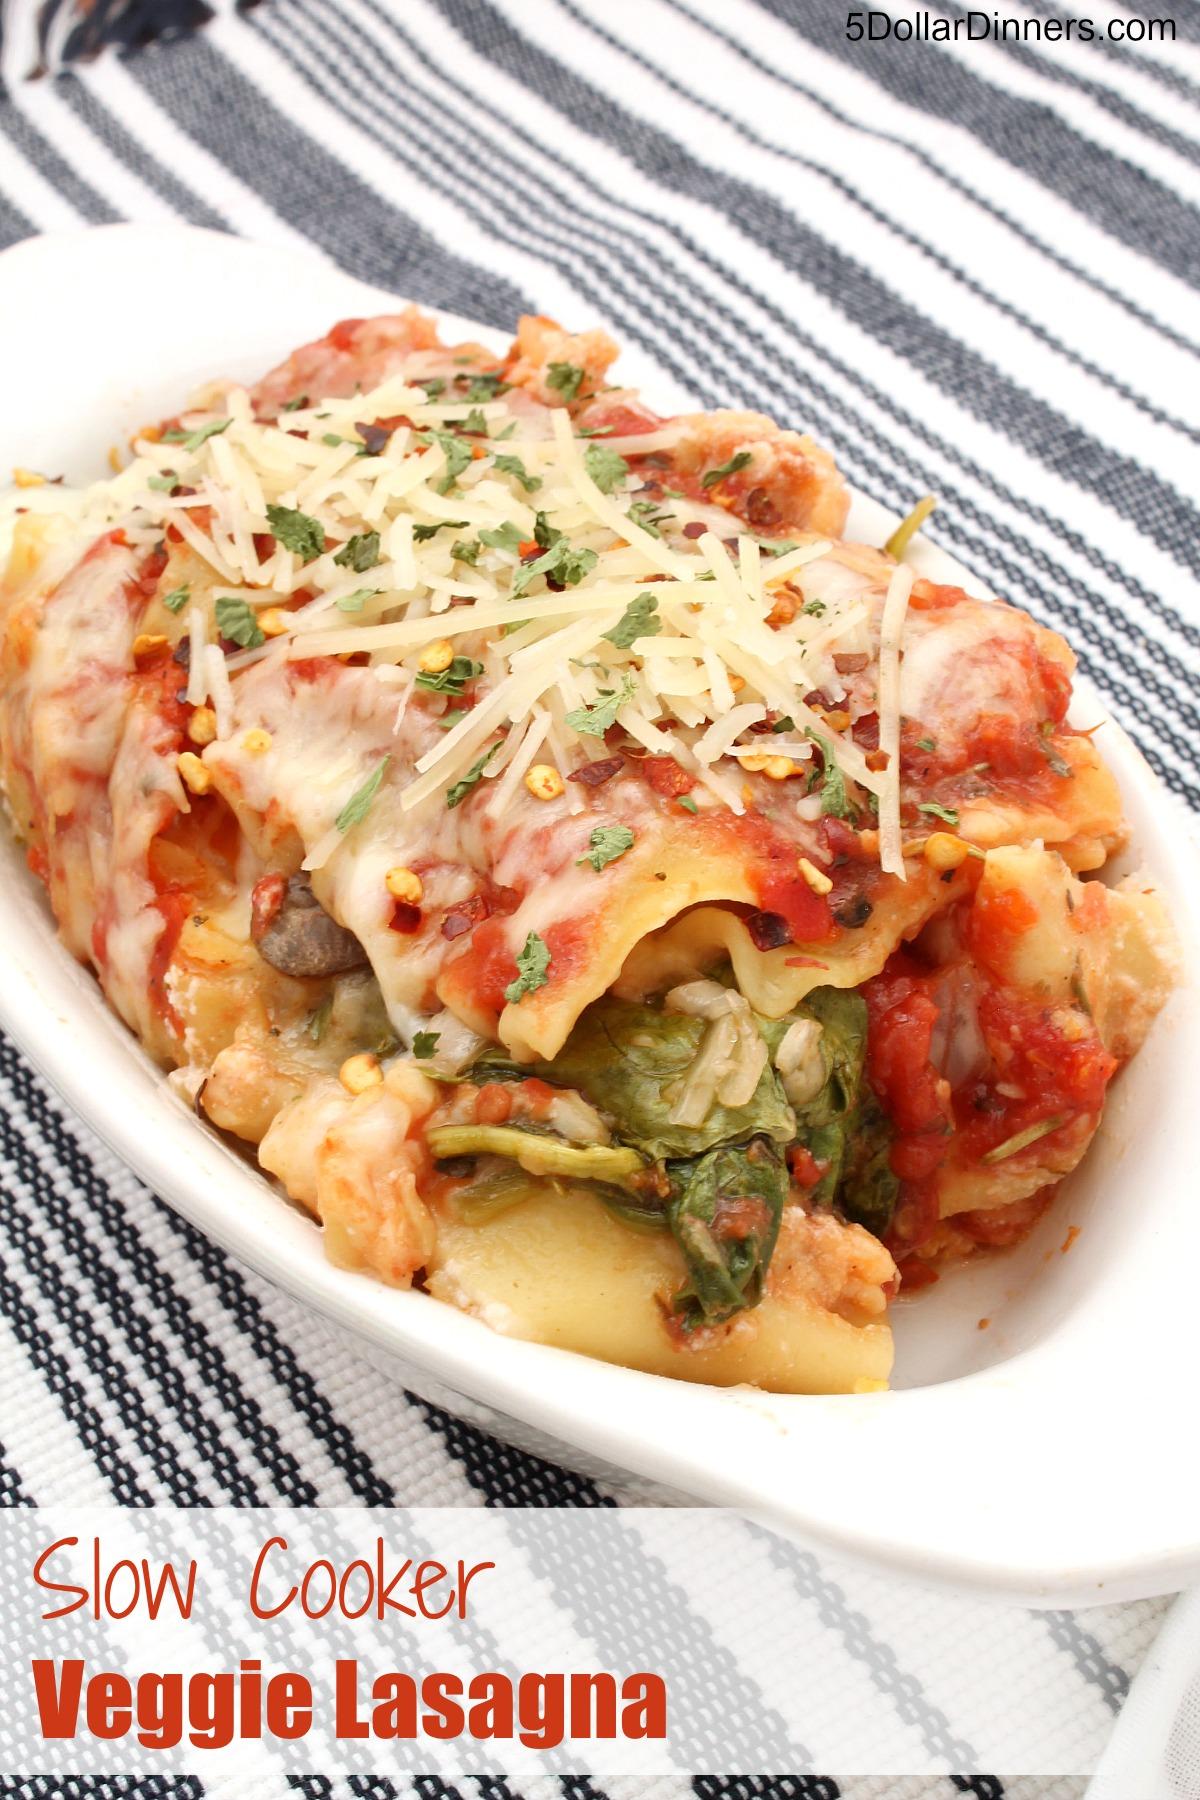 Slow Cooker Veggie Lasagna from 5DollarDinners.com